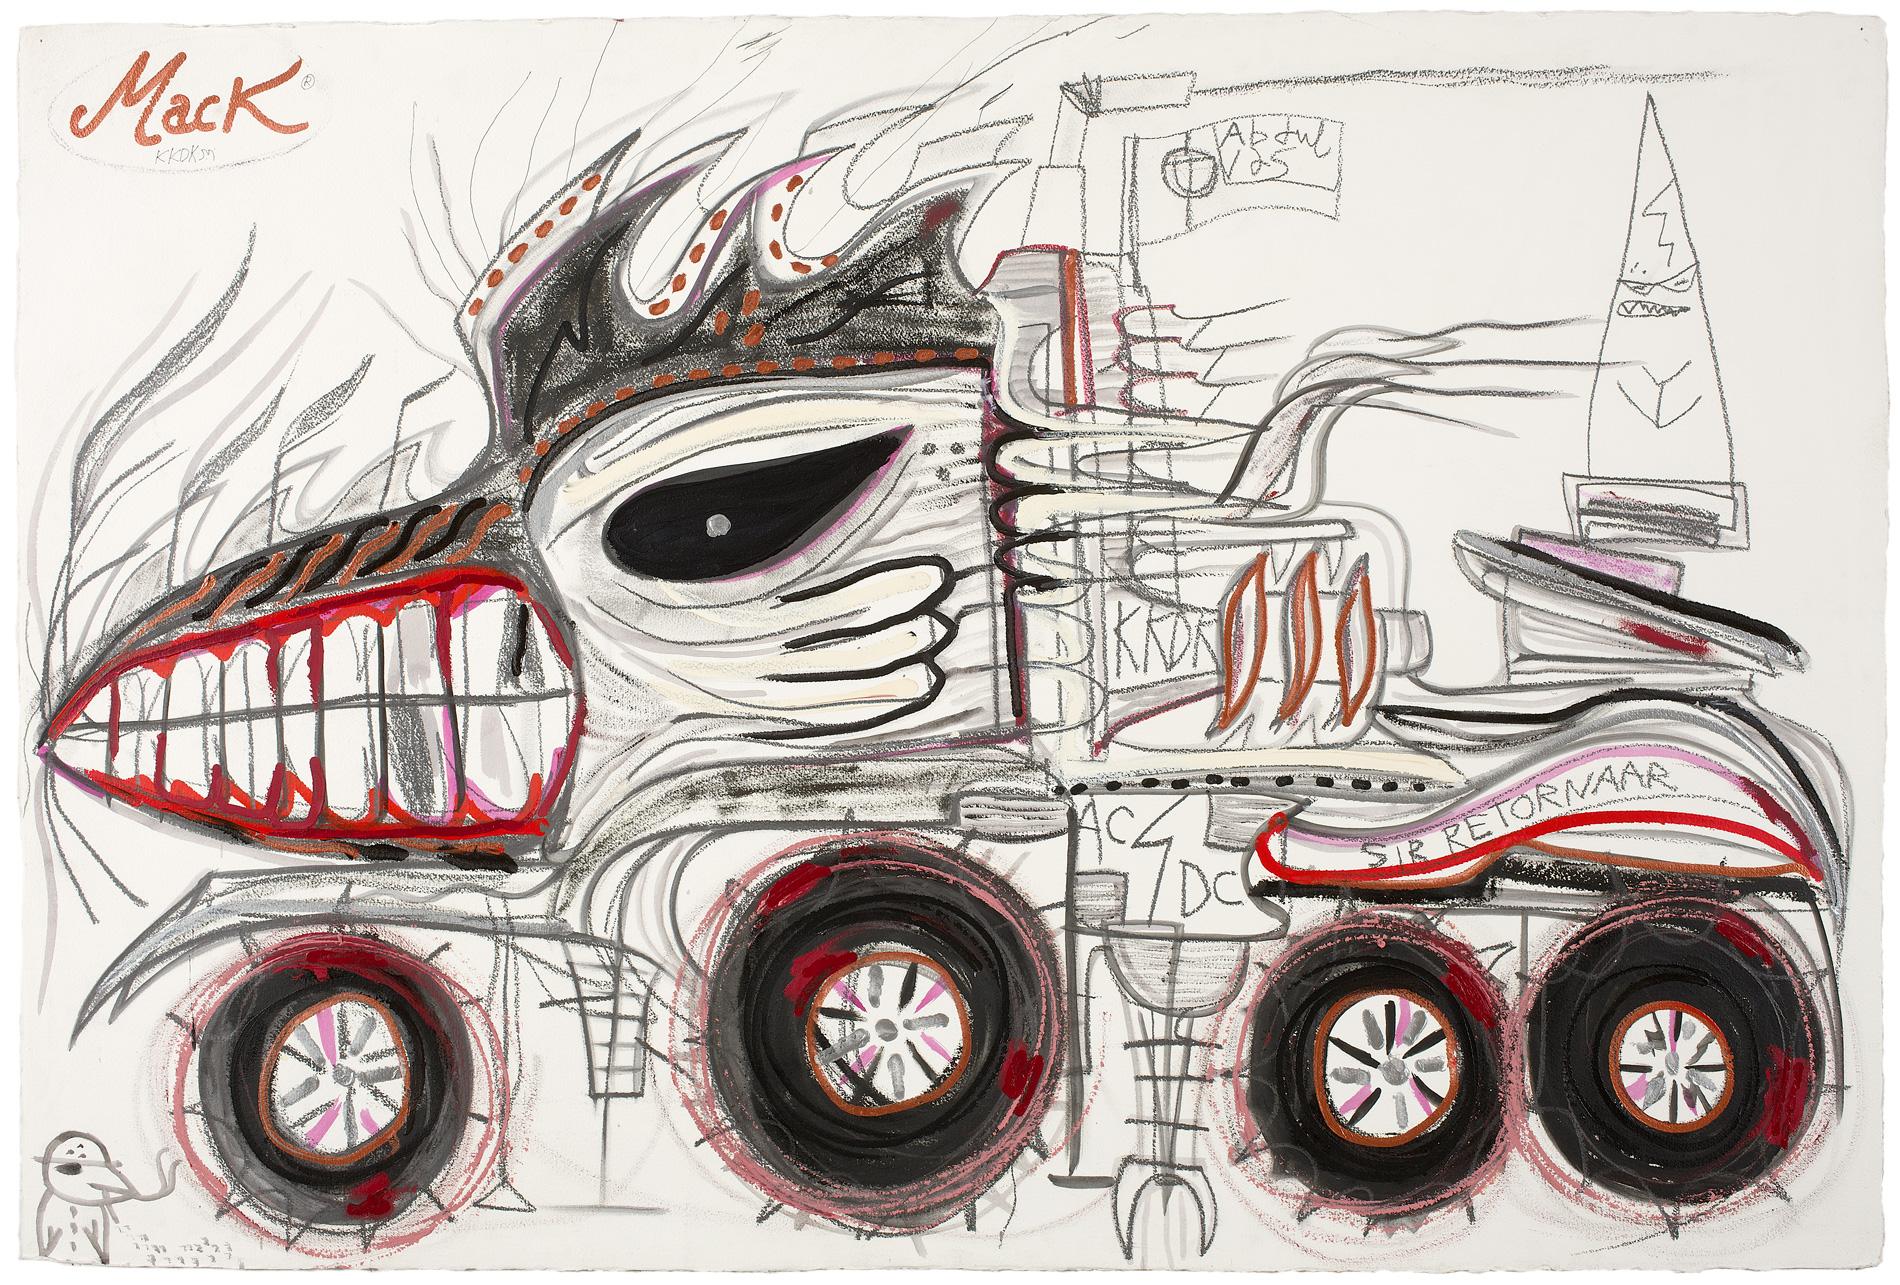 Philip Guston. Abdul Vas. American Truck. Mack, 2003. AC/DC Highway To Hell. Hypebeast